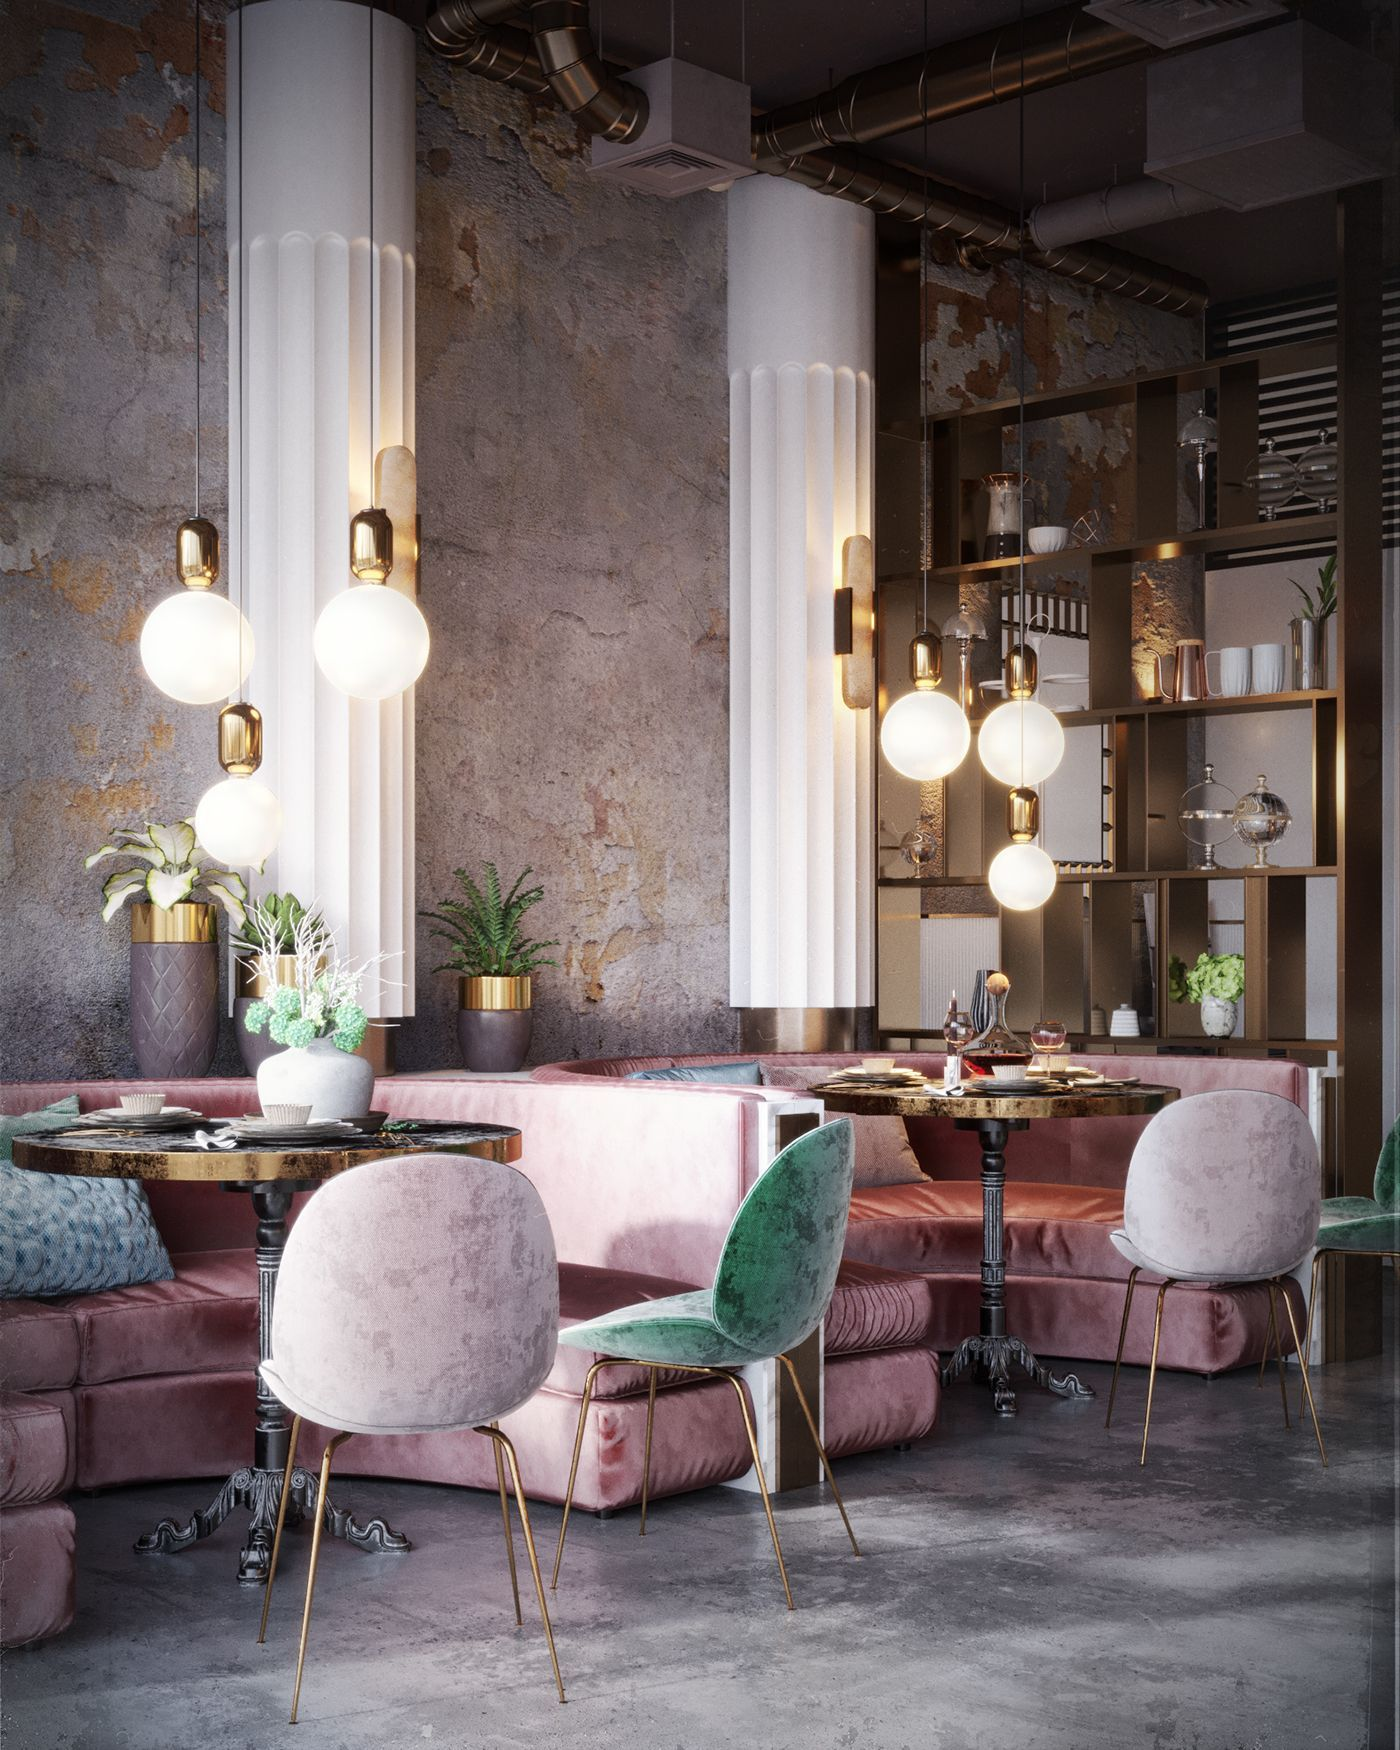 45 Best Recomended Art Deco Interior Design Ideas For Your Home Diseno De Cafeteria Diseno De Interiores Restaurante Interior